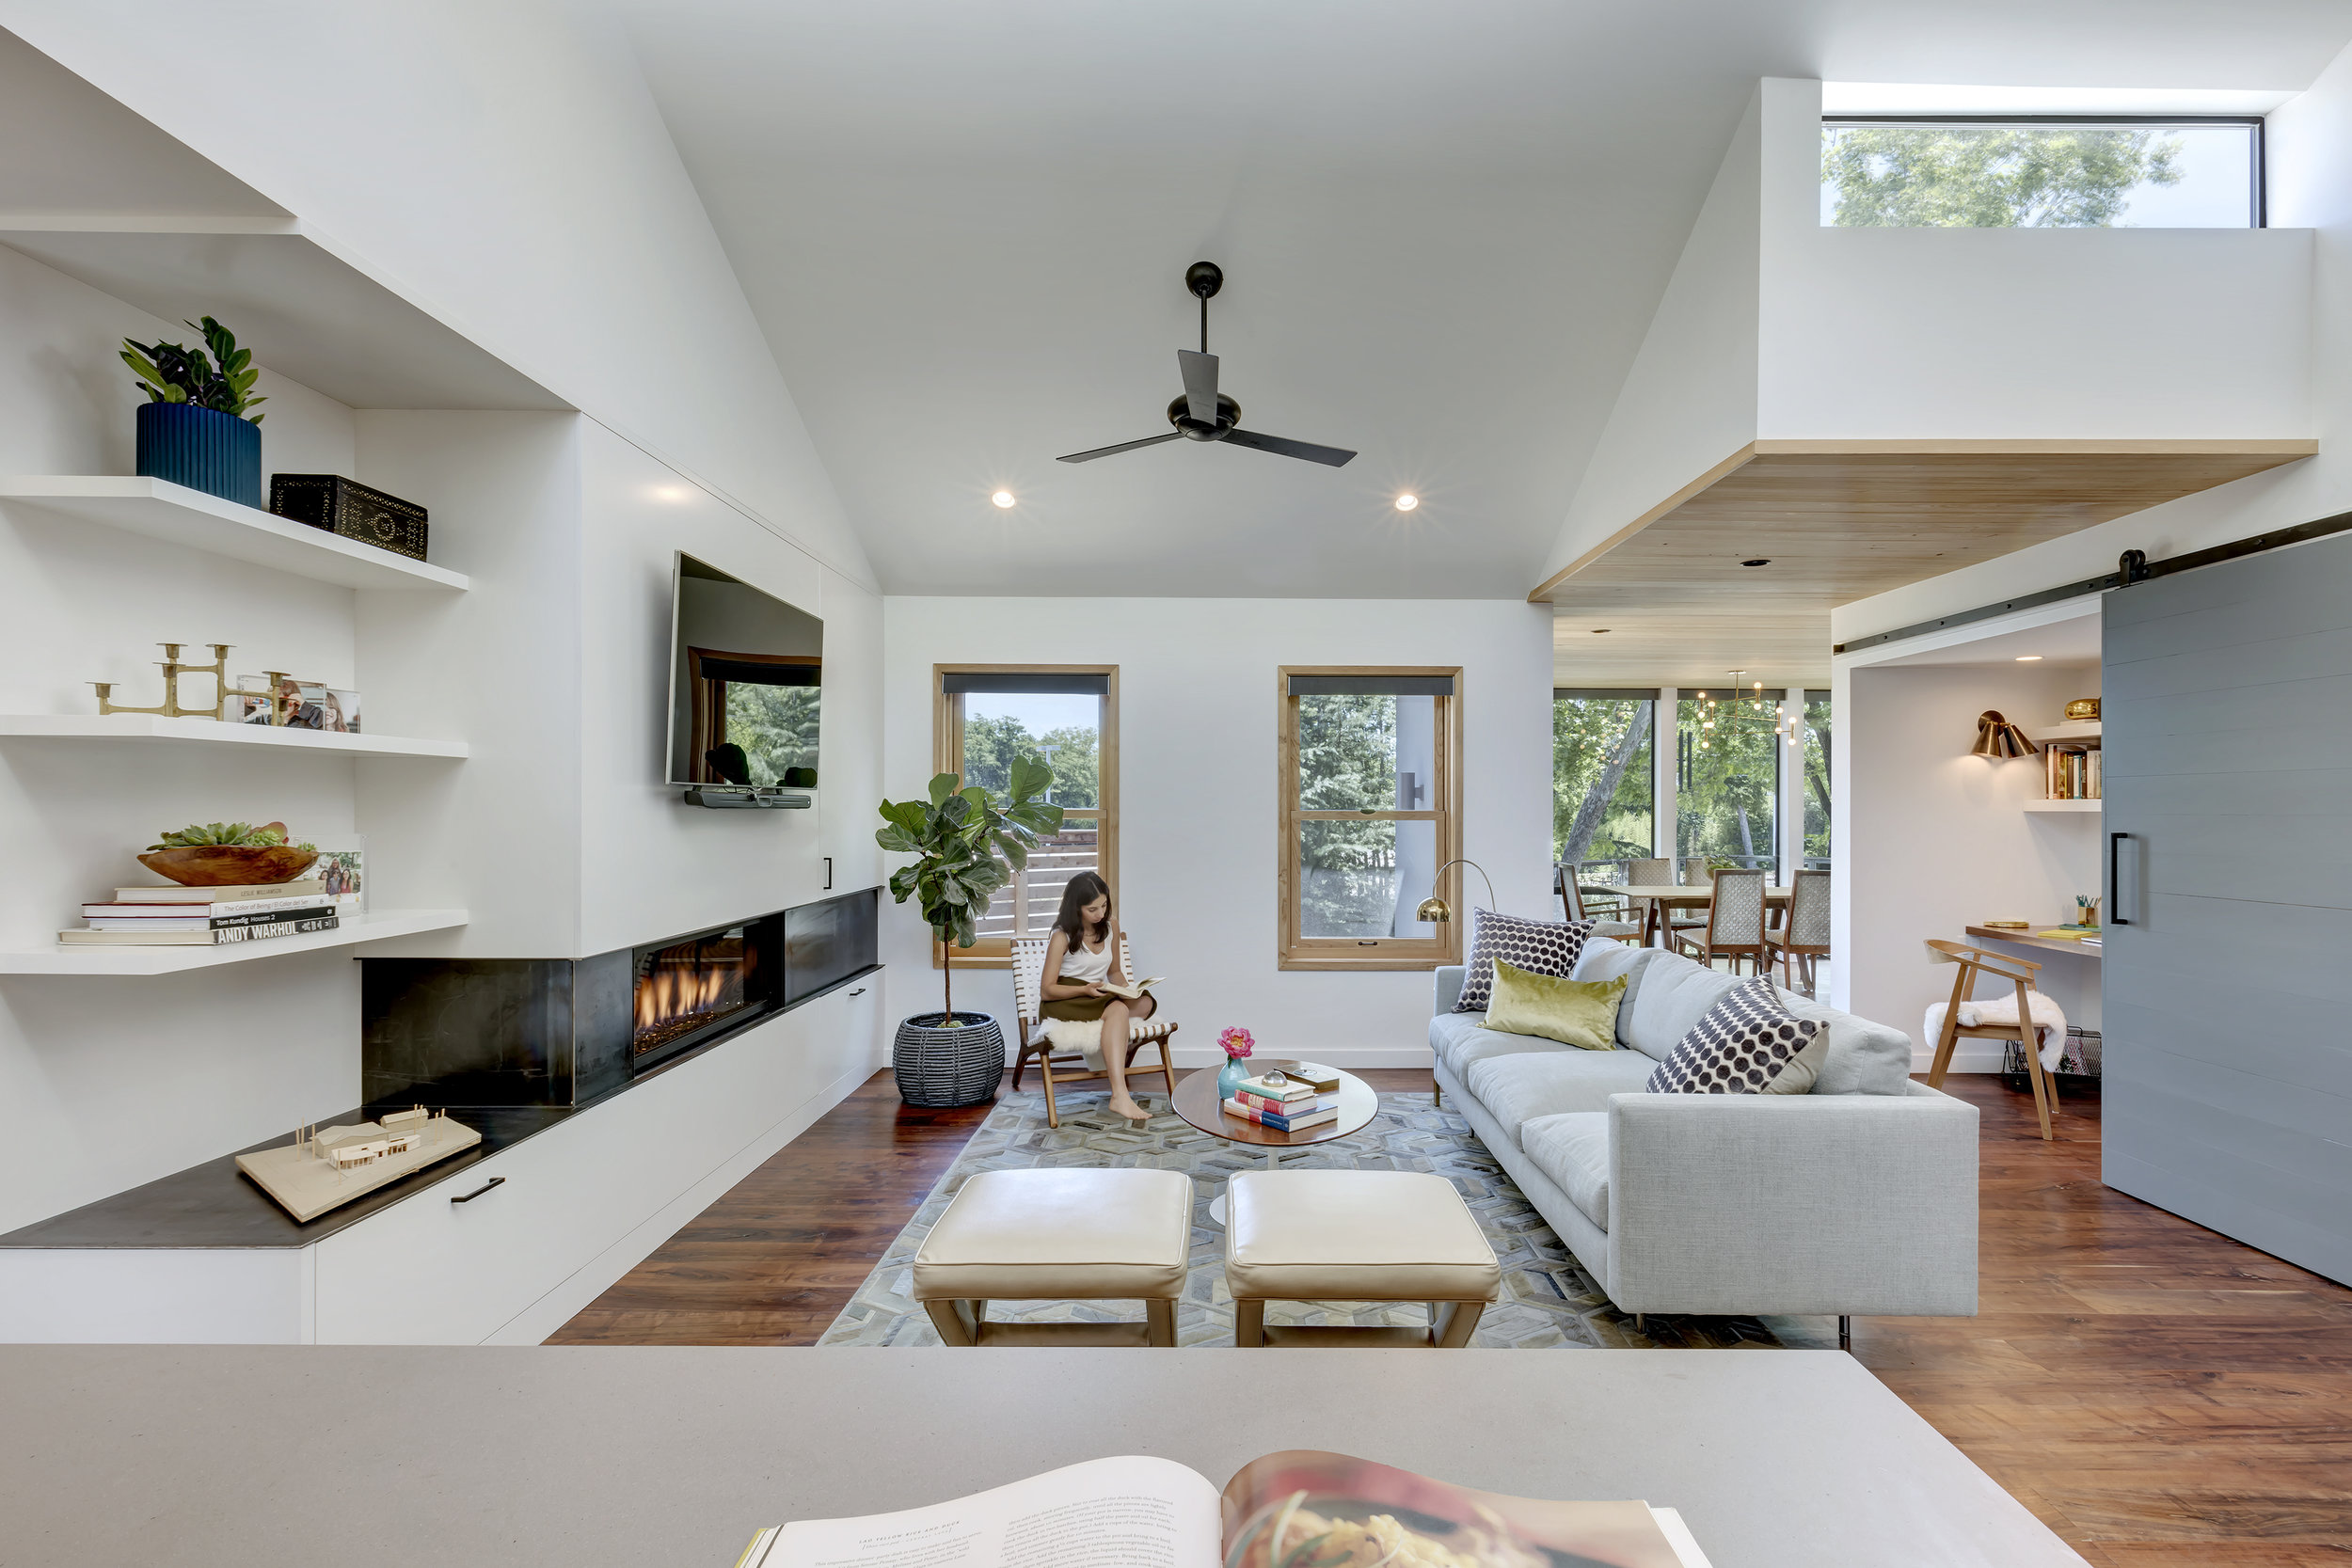 Interlock House by Matt Fajkus MF Architecture_Photo 3 by Charles Davis Smith.jpg